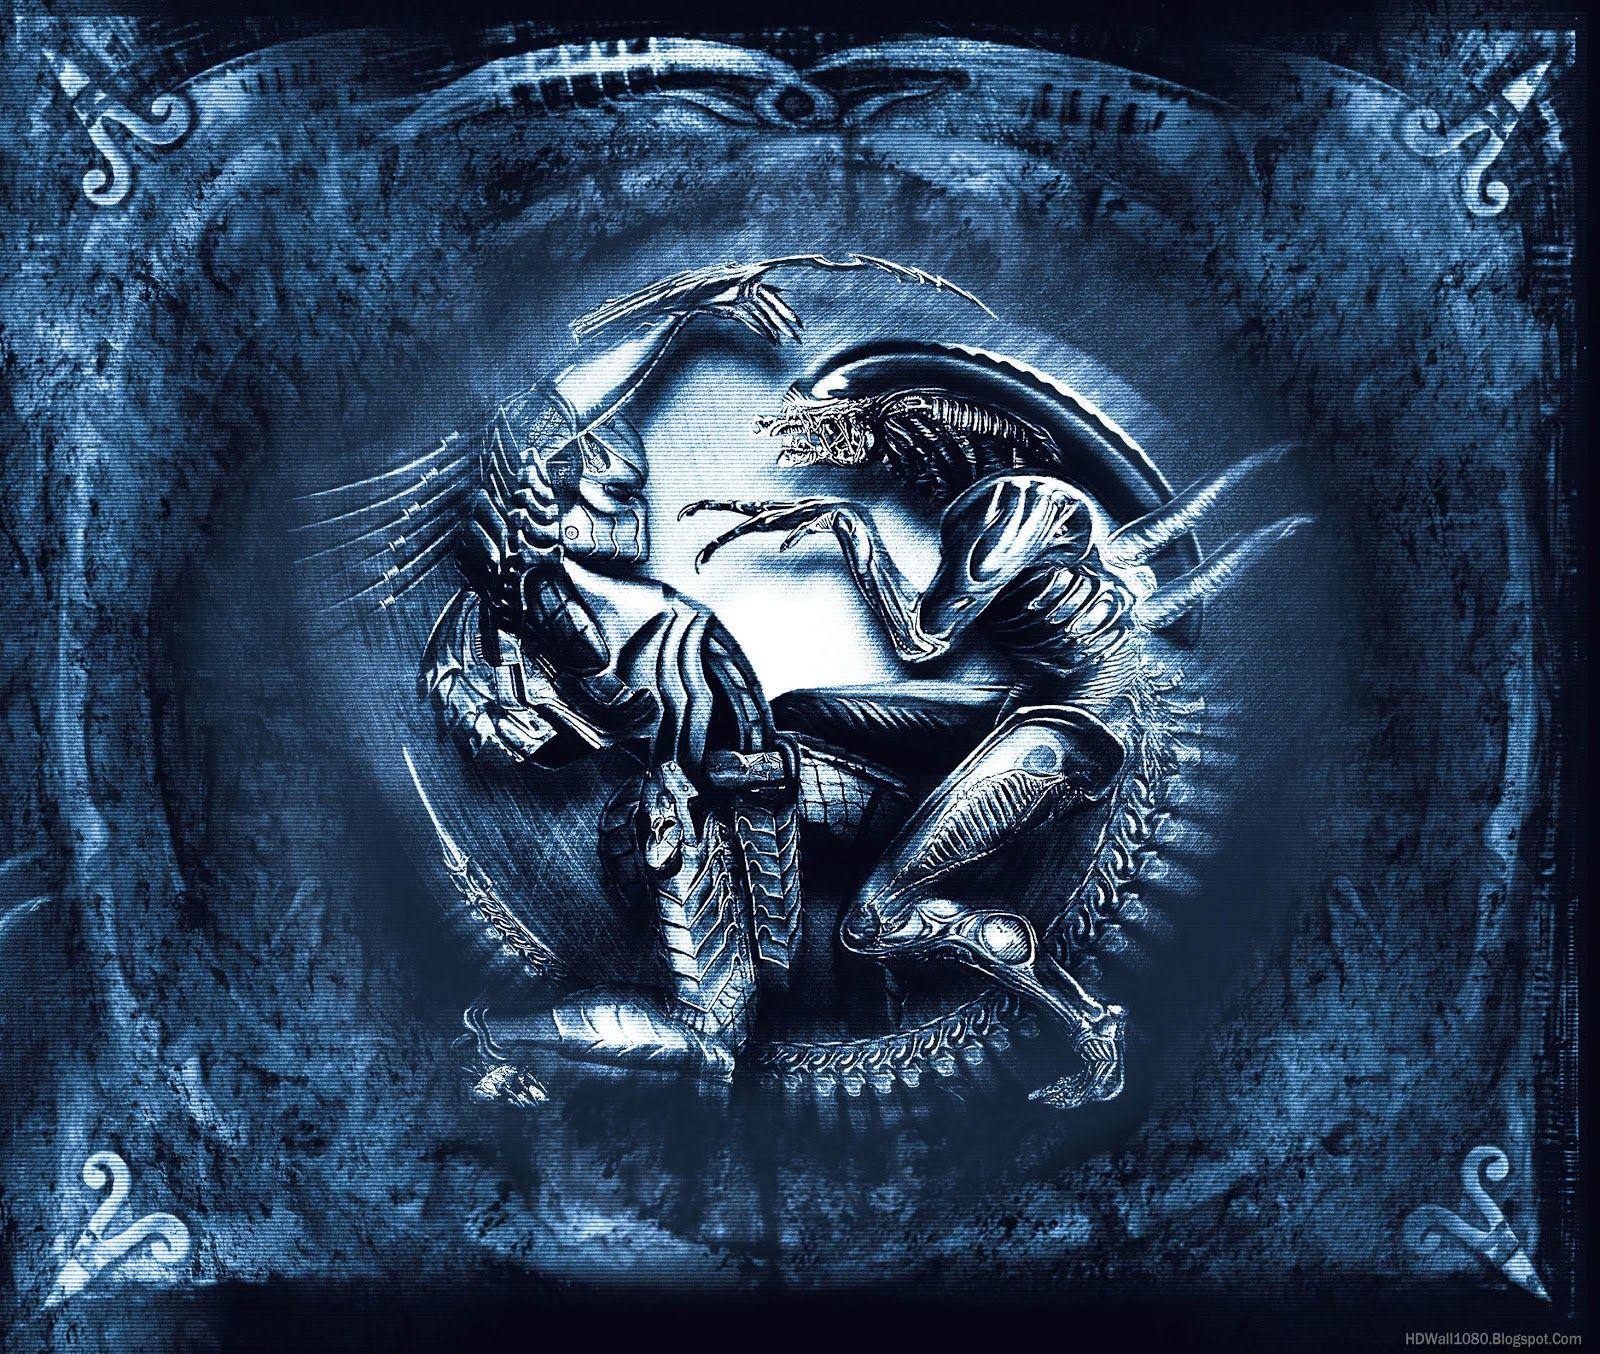 Hd New Wallpapers Alien Vs Predator Wallpaper Alien Vs Predator